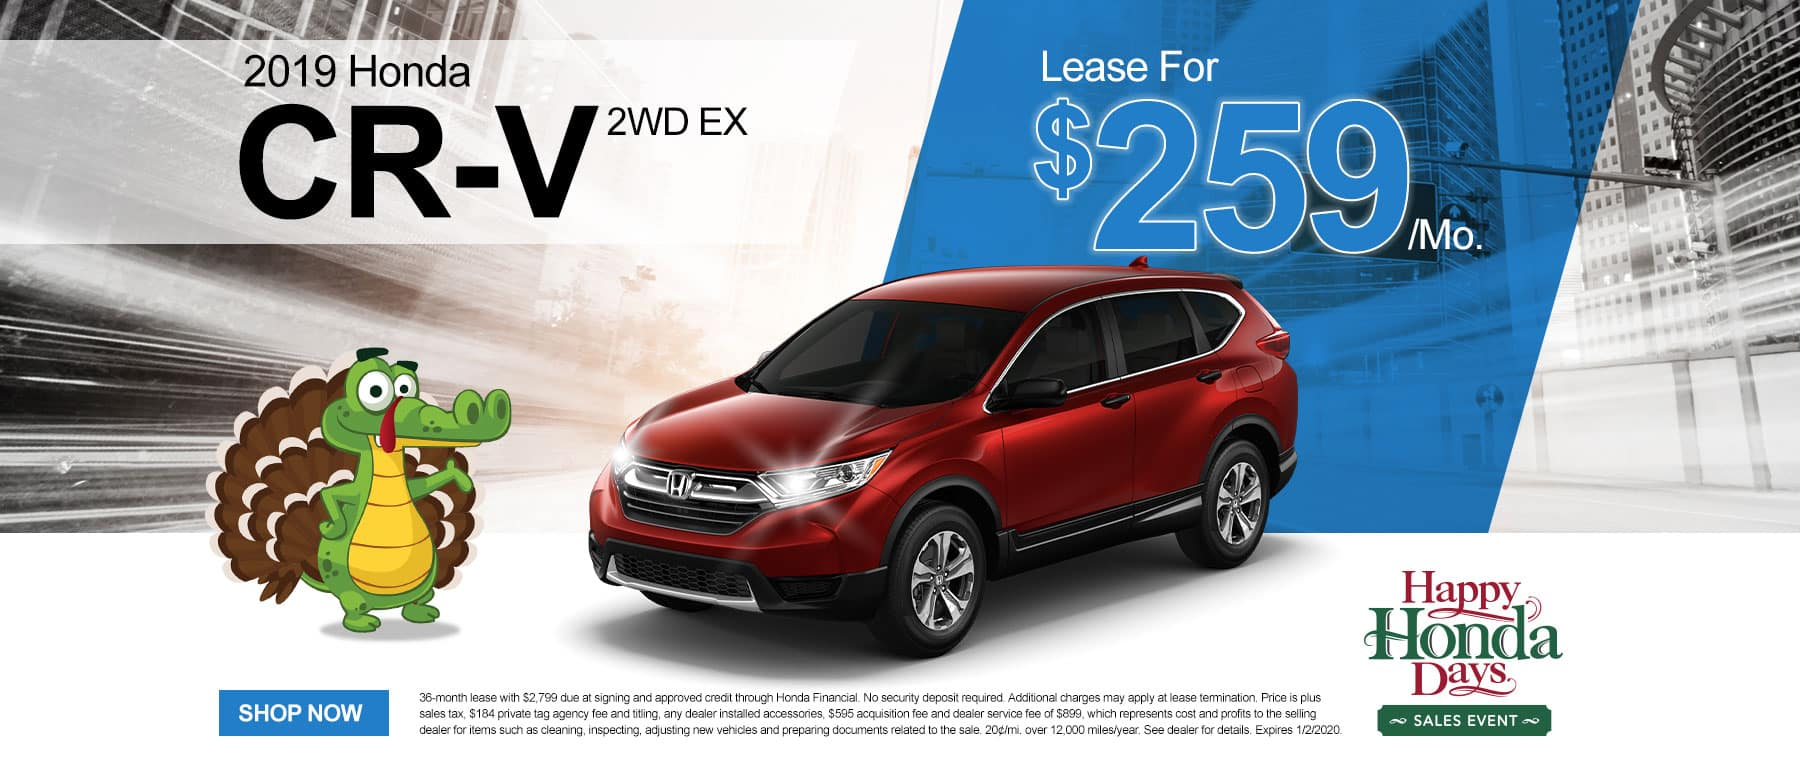 2019 Honda CR-V 2WD EX | Lease For $259/Mo | Happy Honda Days Sales Event